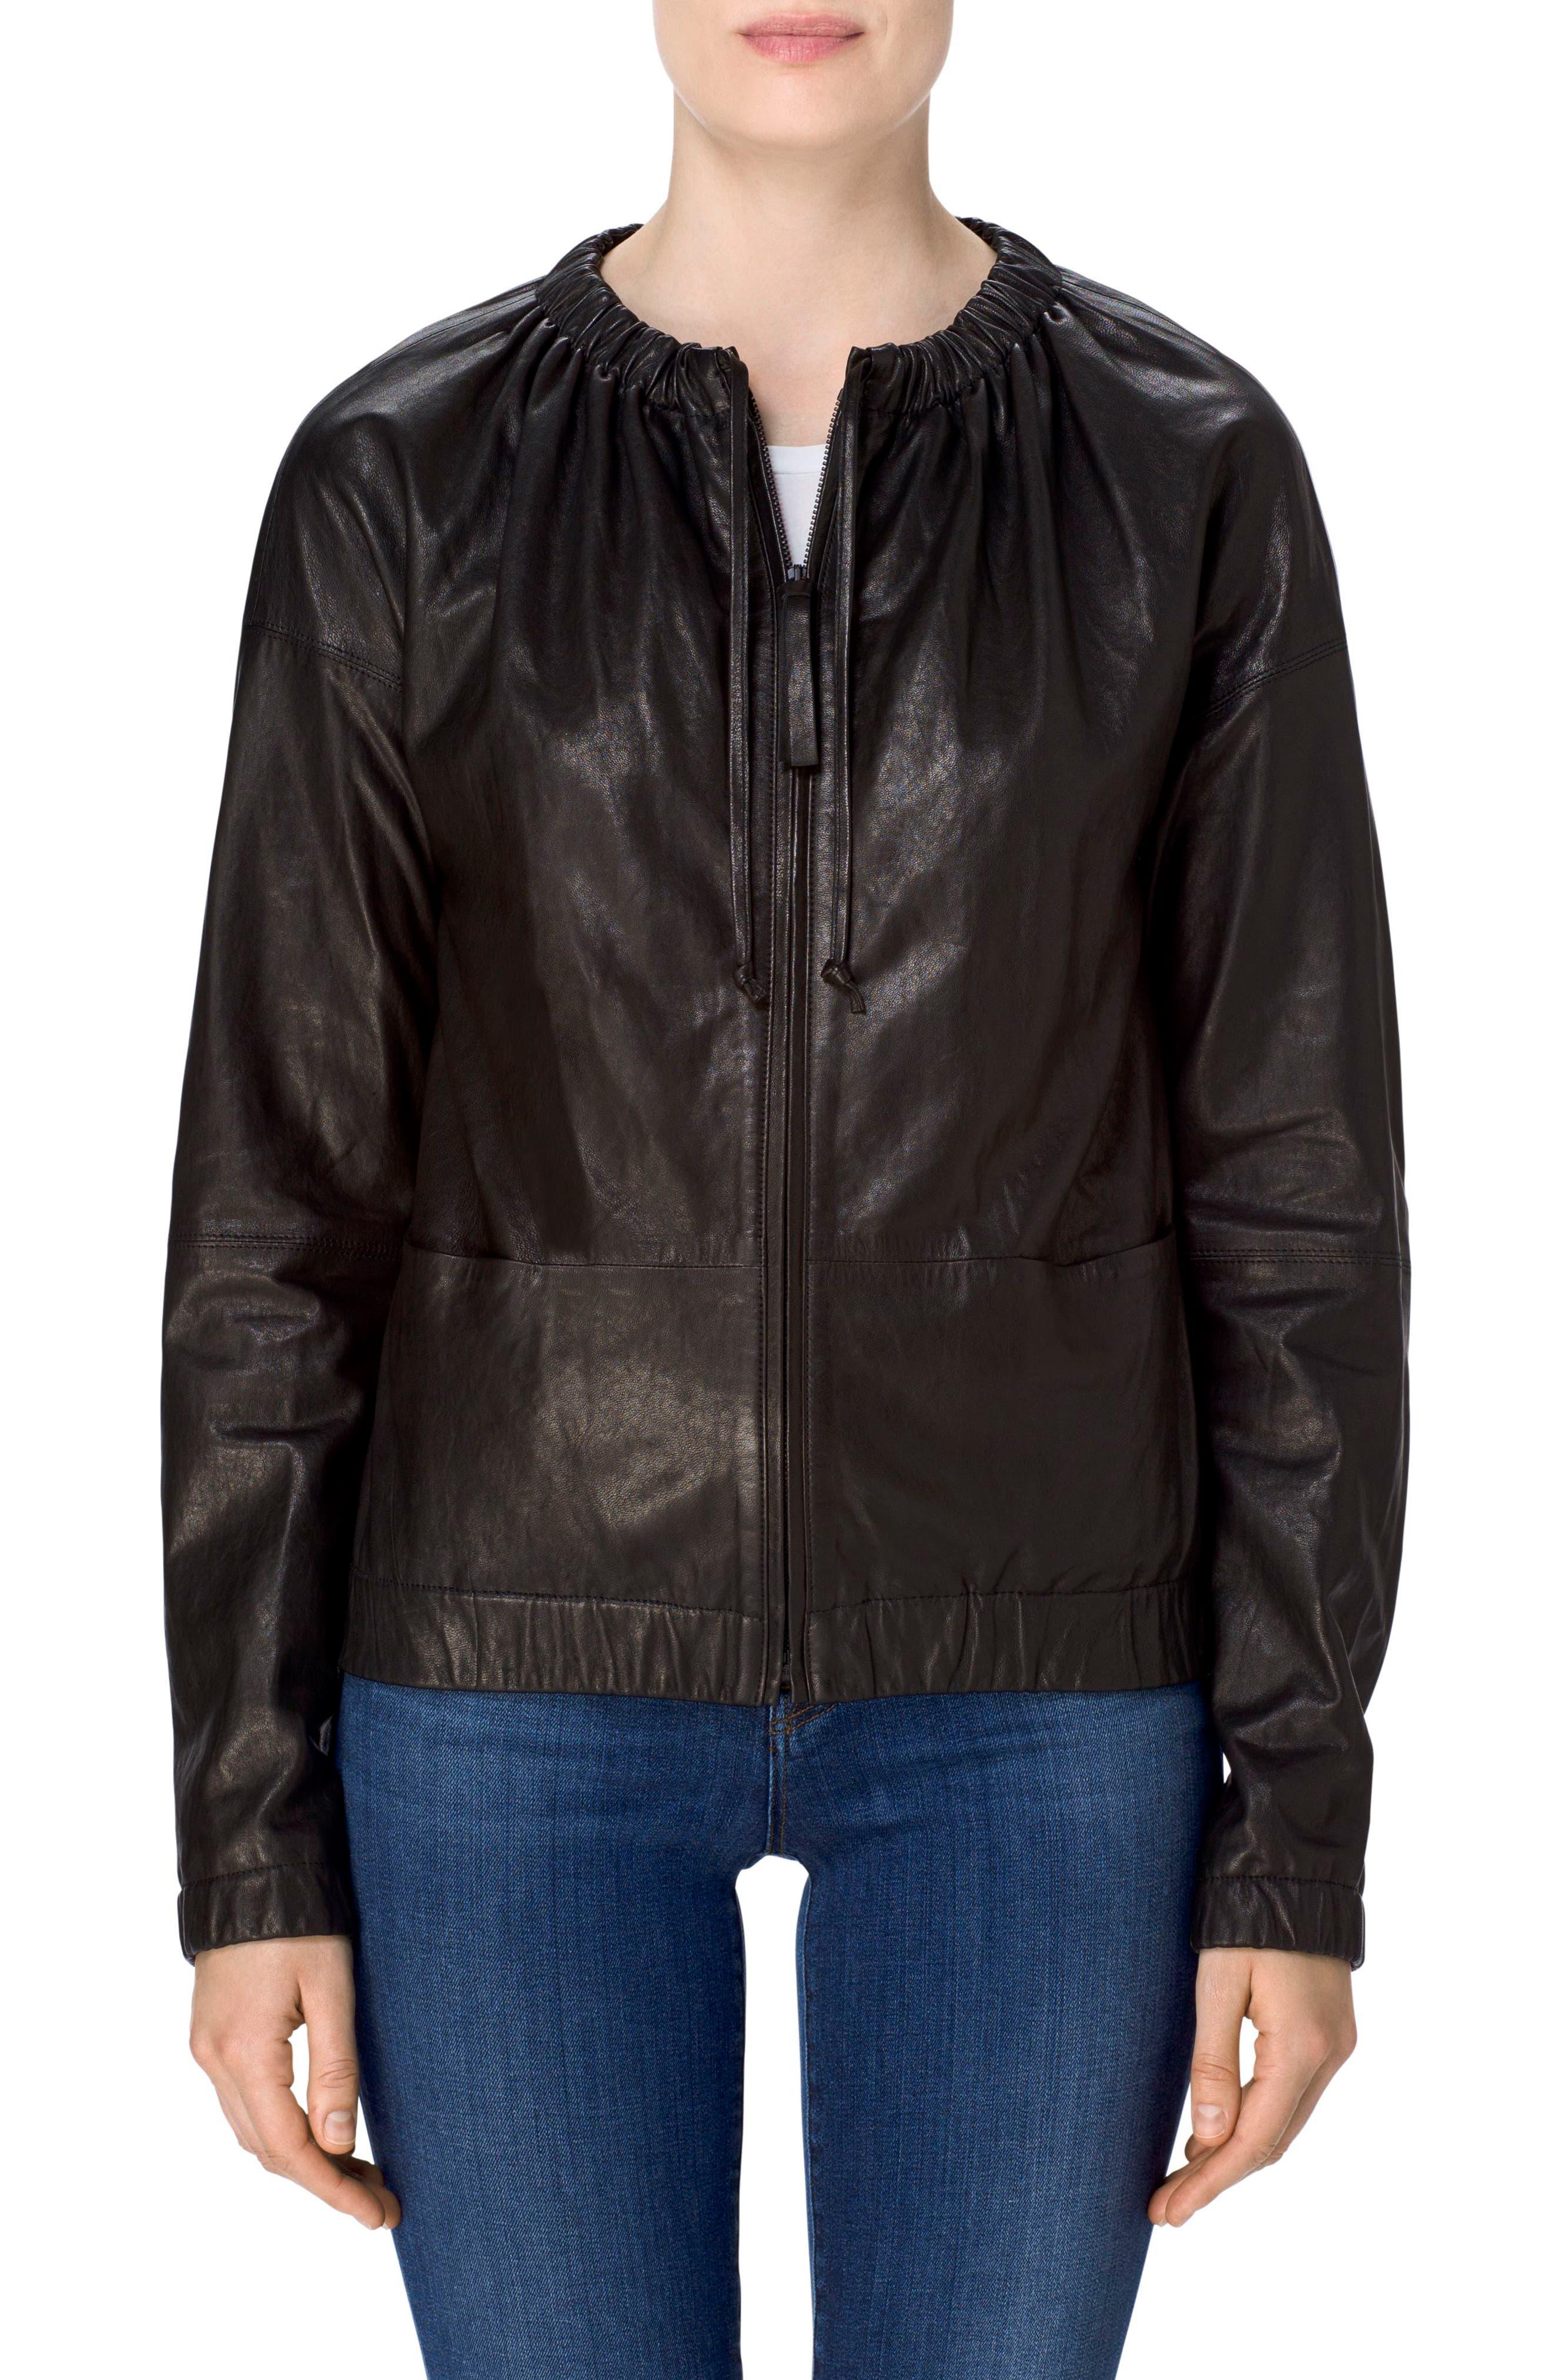 Baez Leather Bomber Jacket,                             Alternate thumbnail 4, color,                             Black